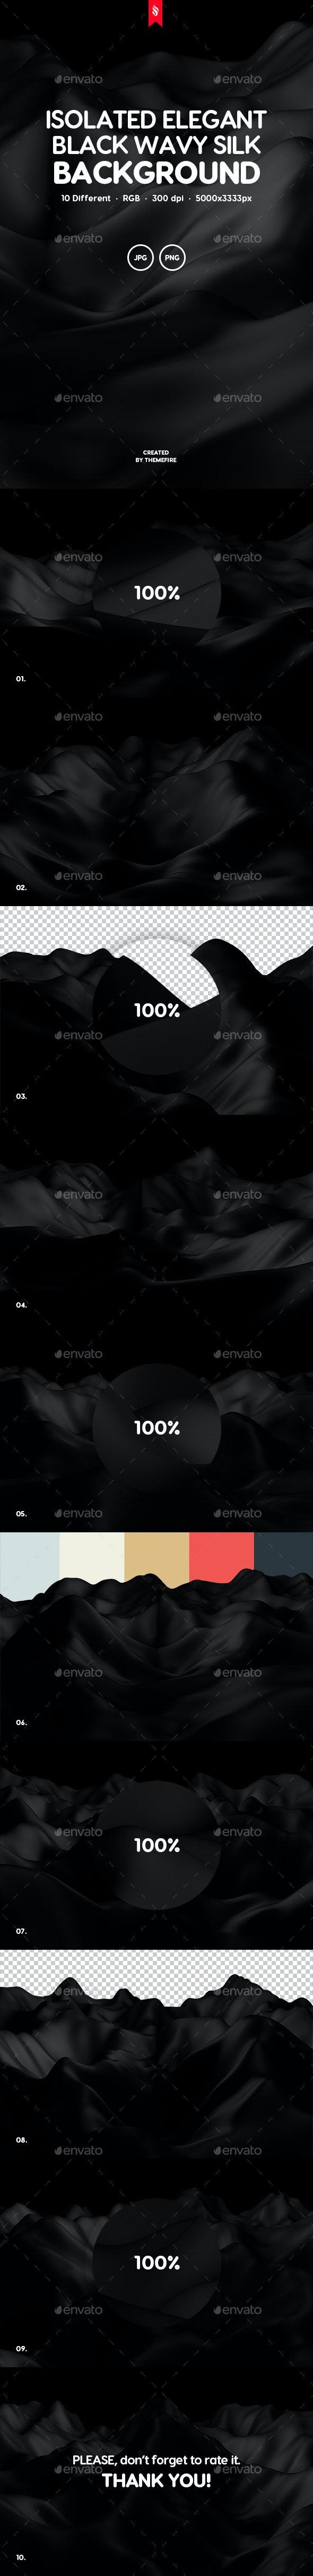 Isolated Elegant Black Wavy Silk Backgrounds - Backgrounds Graphics